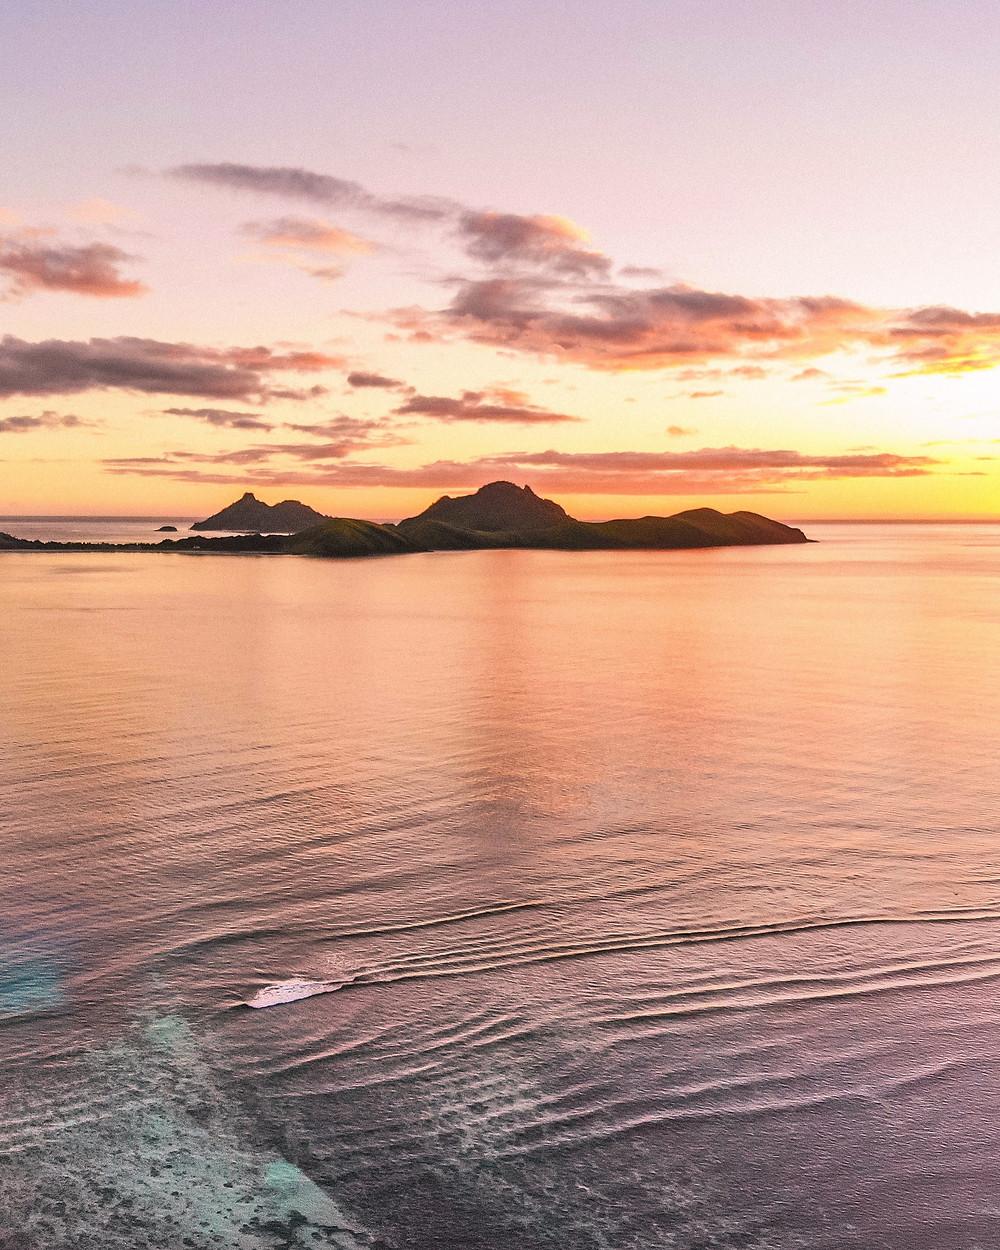 fiji travel guide 7 days